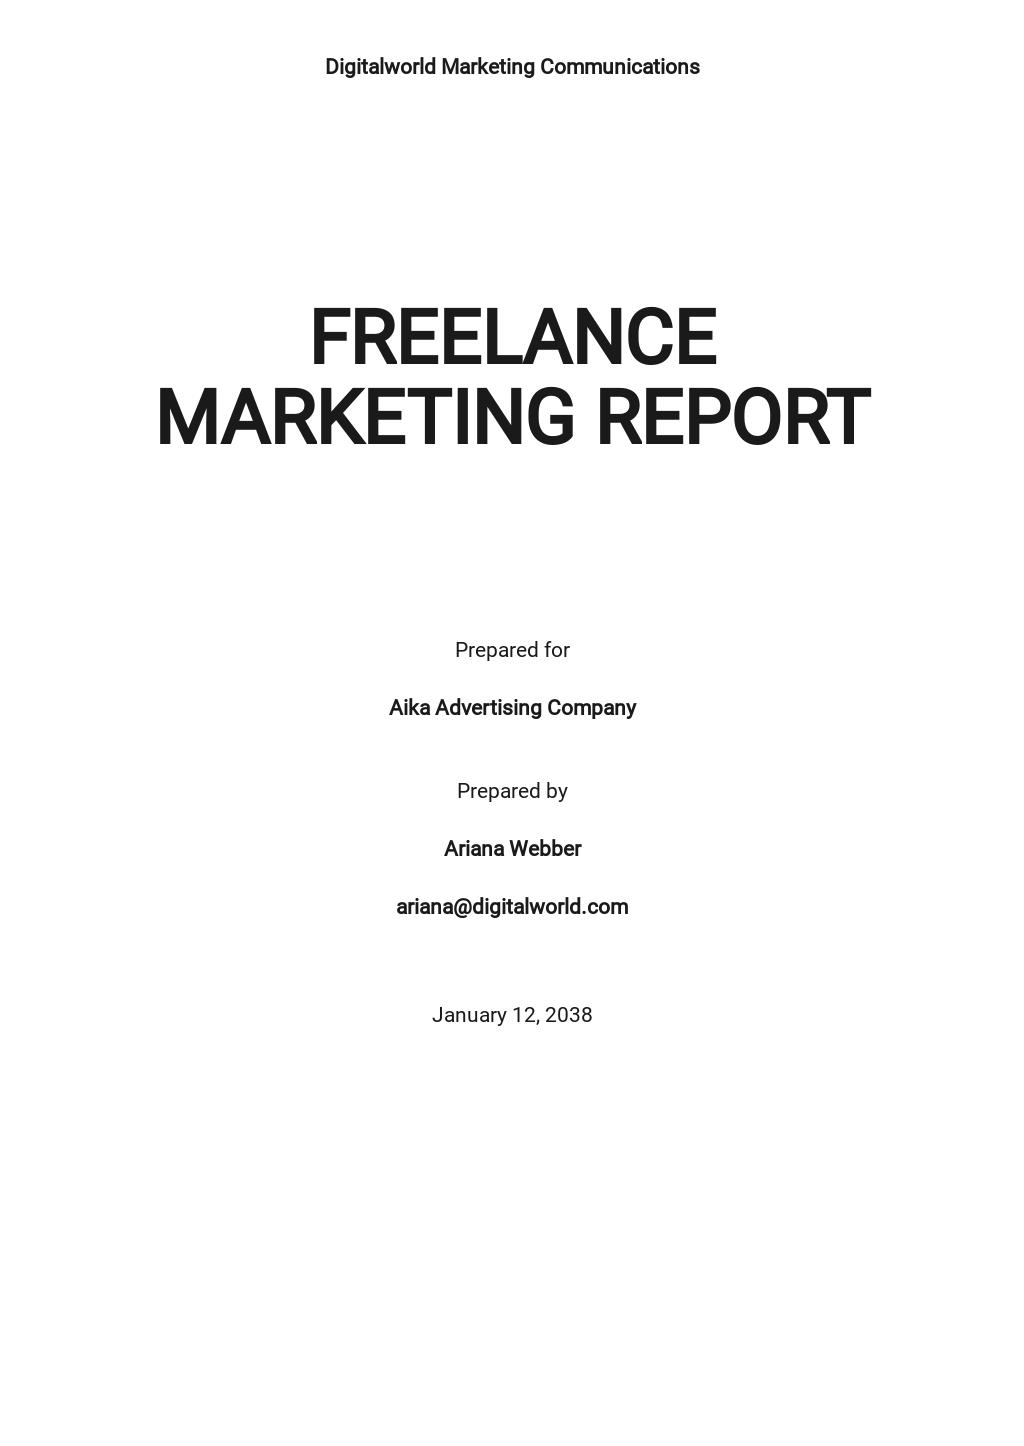 Freelance Marketing Report Template